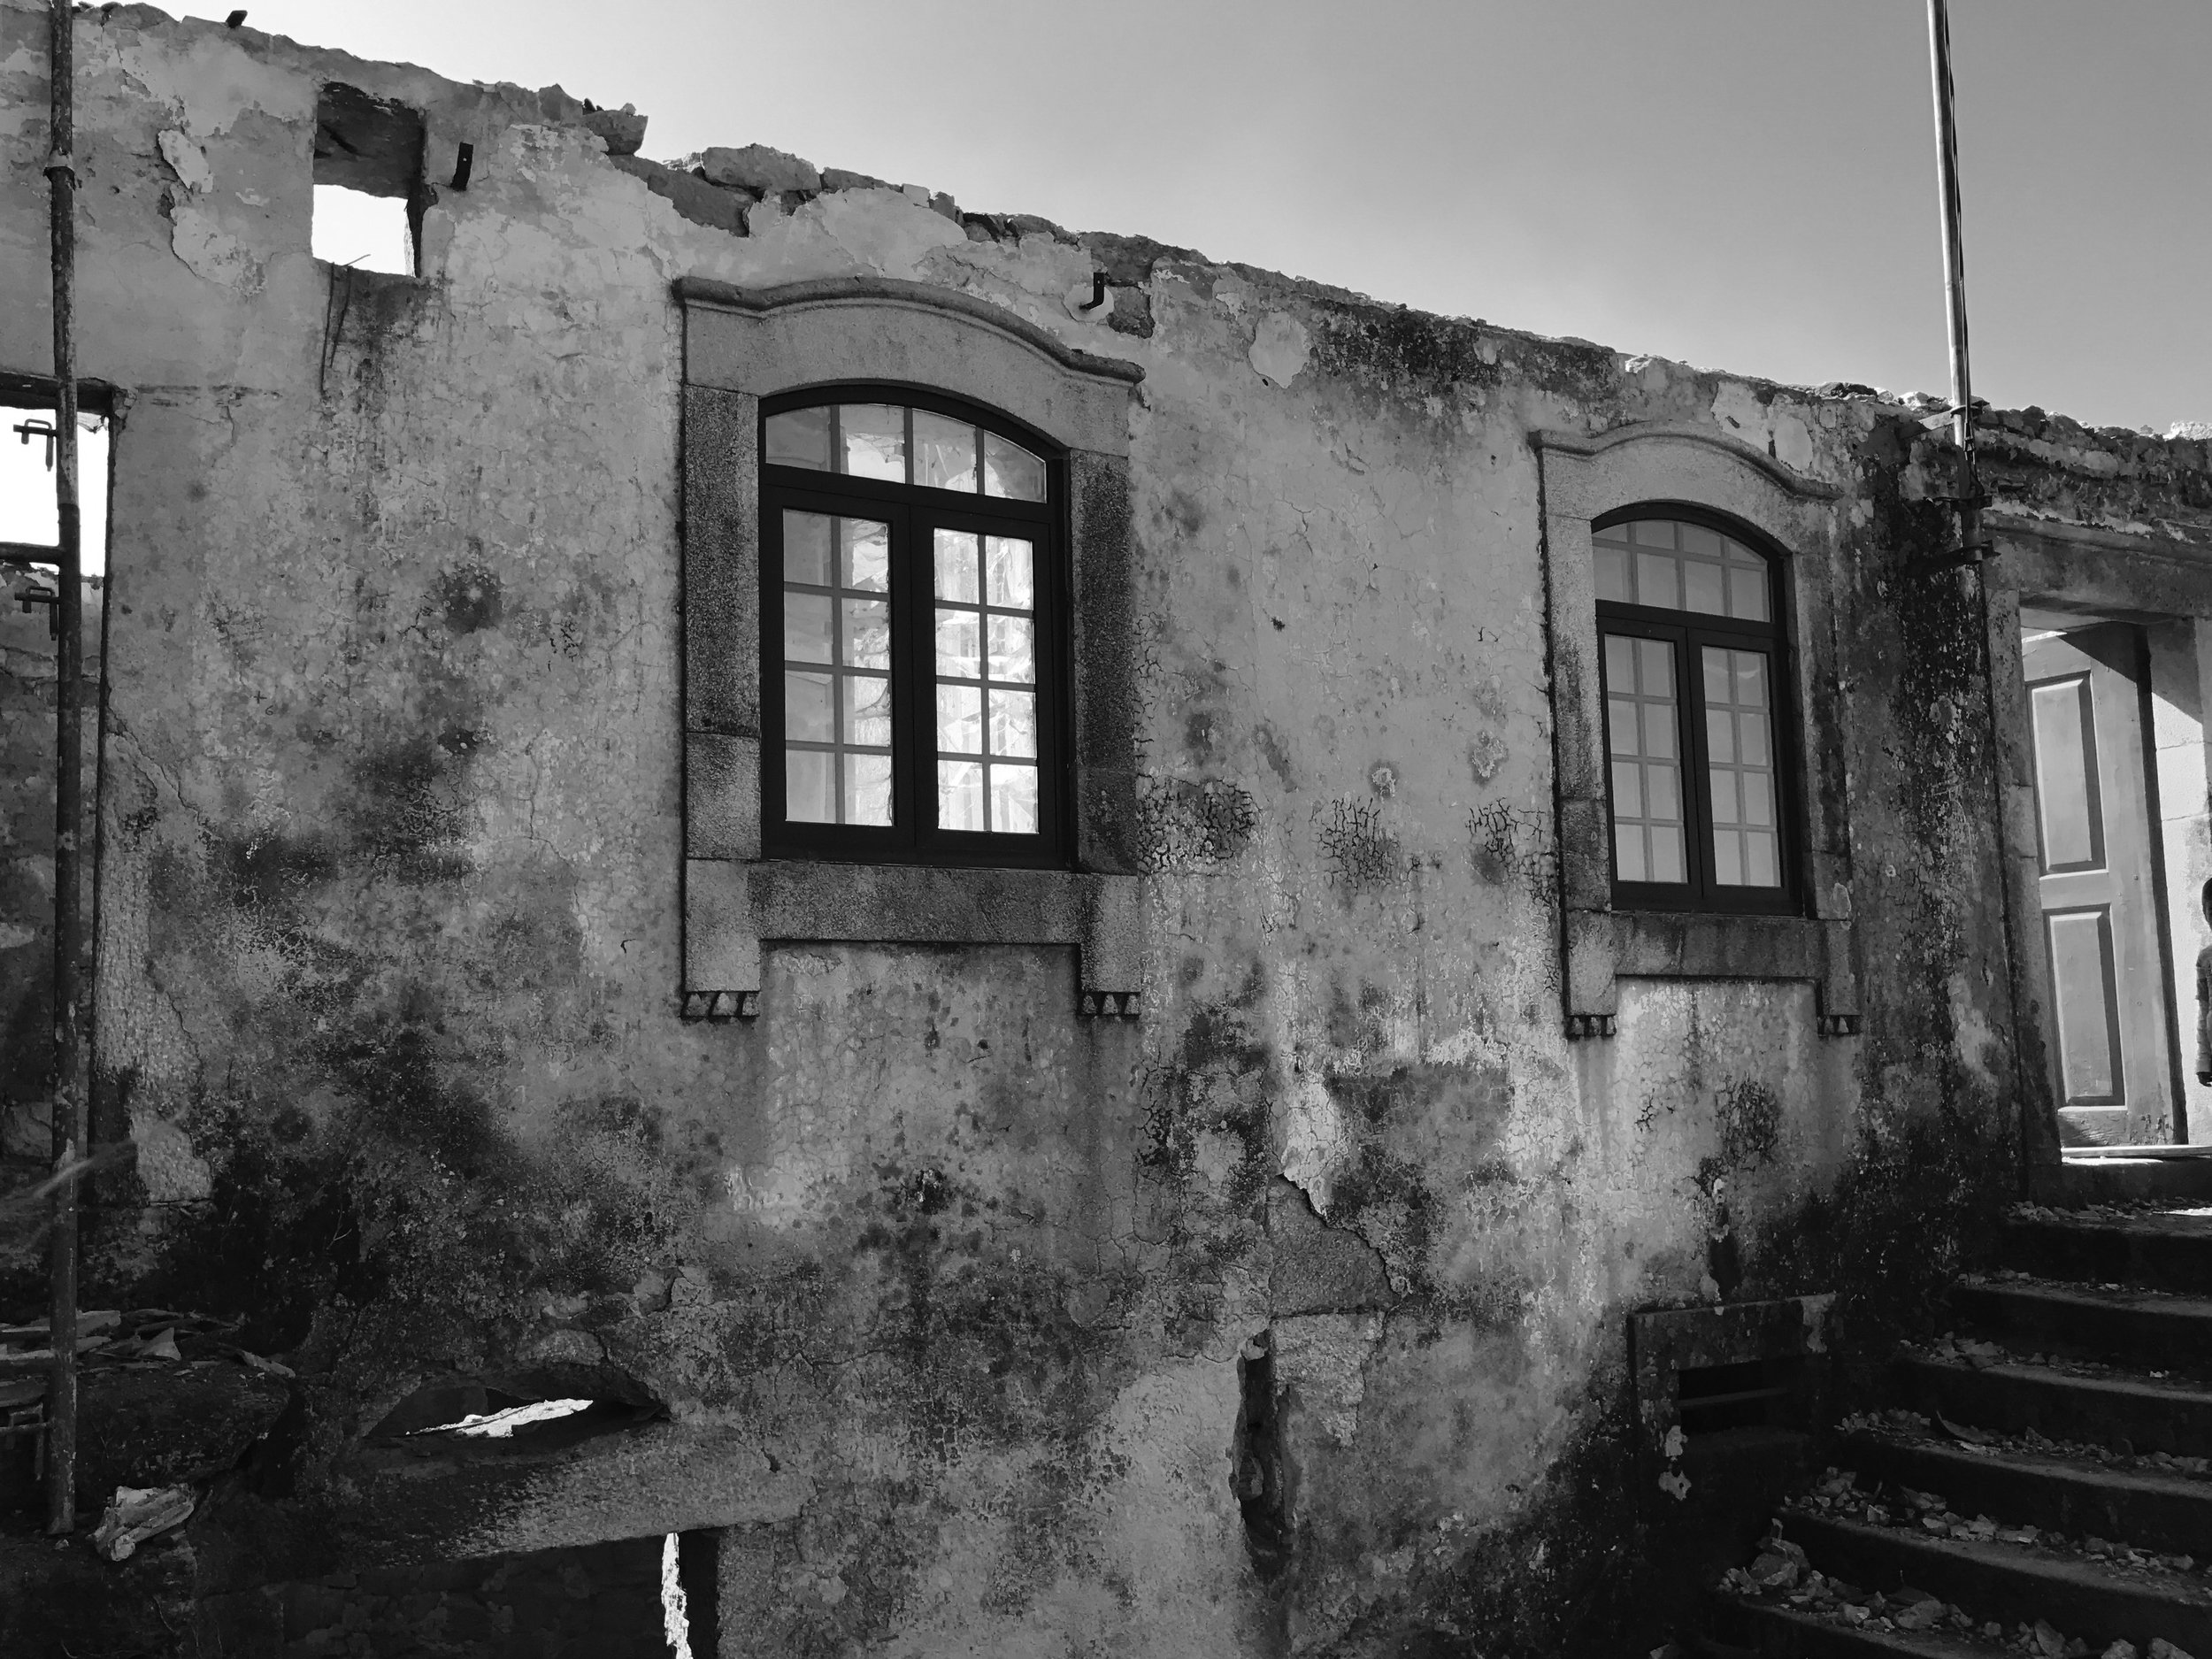 Moradia Folgorosa - Vale de Cambra - EVA atelier - Arquitectura - Obra (8).jpg